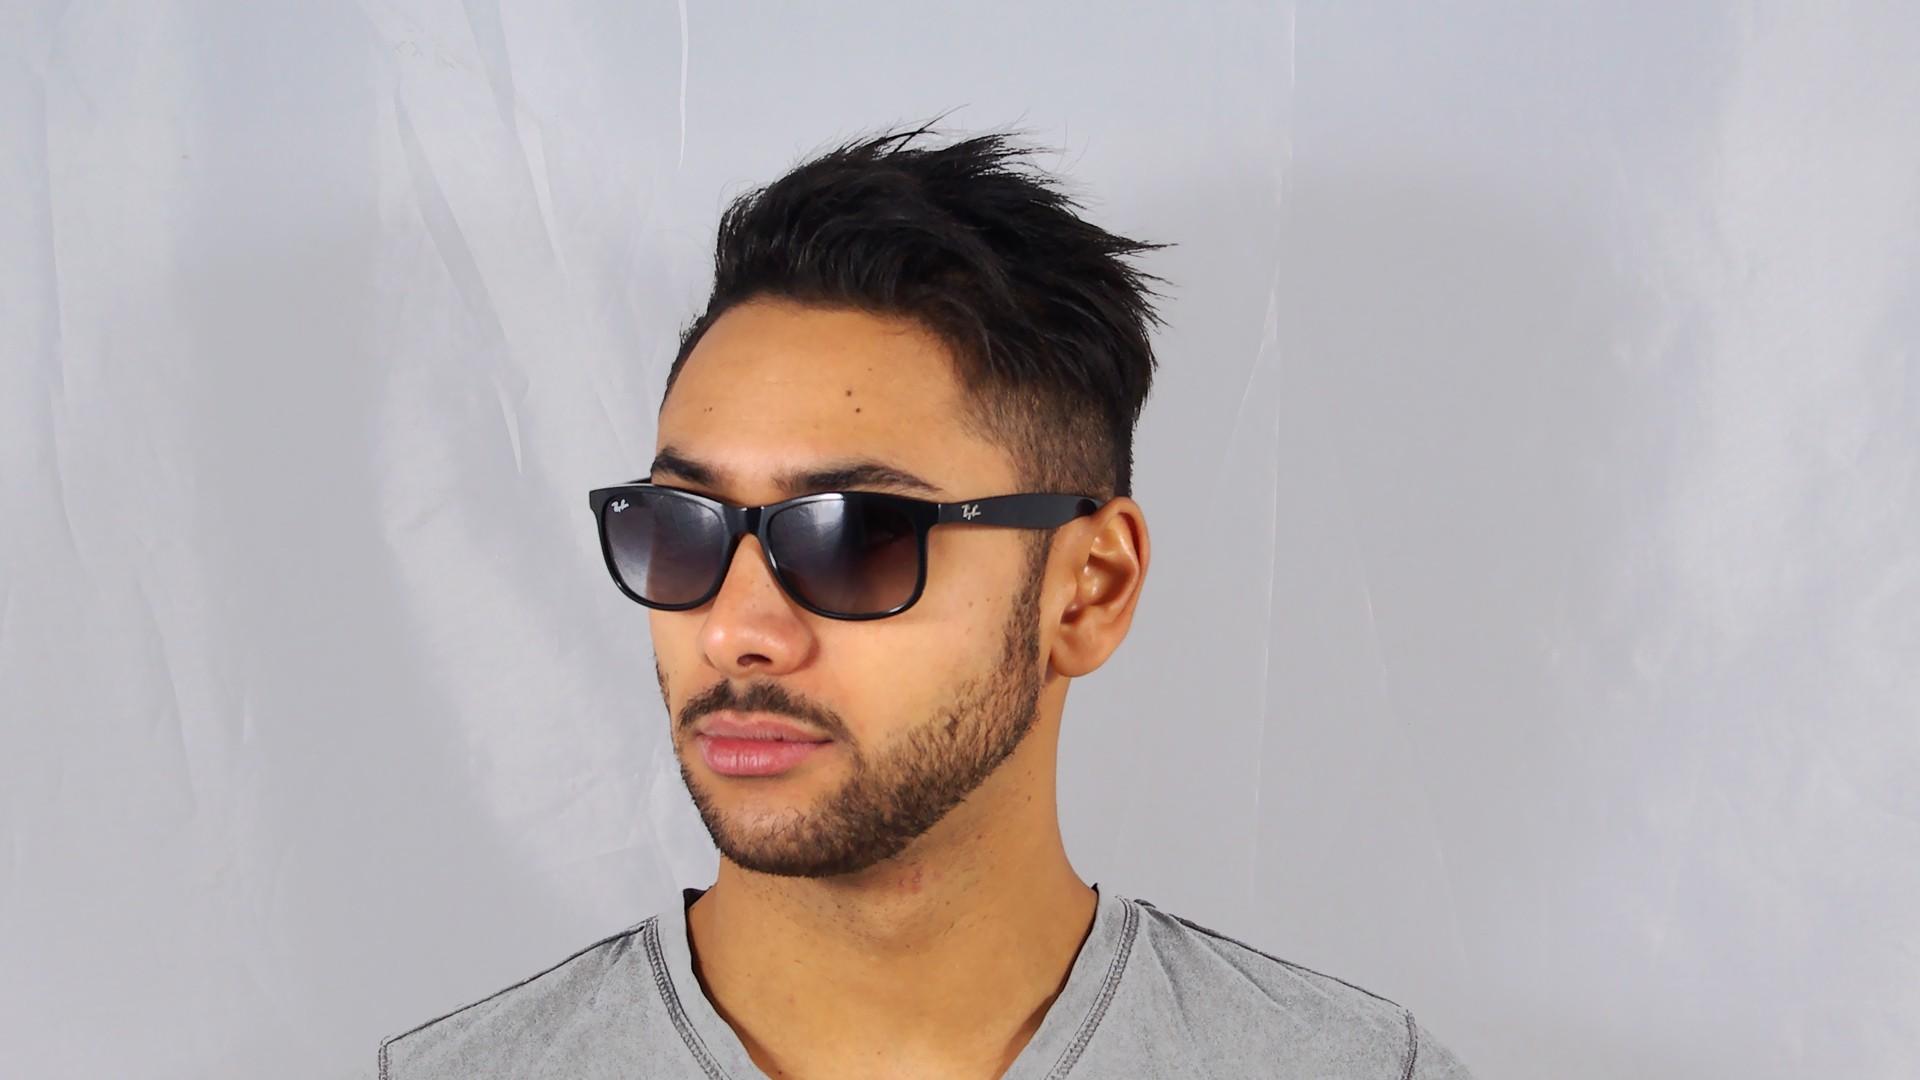 4e0a80ae88 Sunglasses Ray-Ban Andy Black RB4202 601 8G 55-17 Medium Gradient